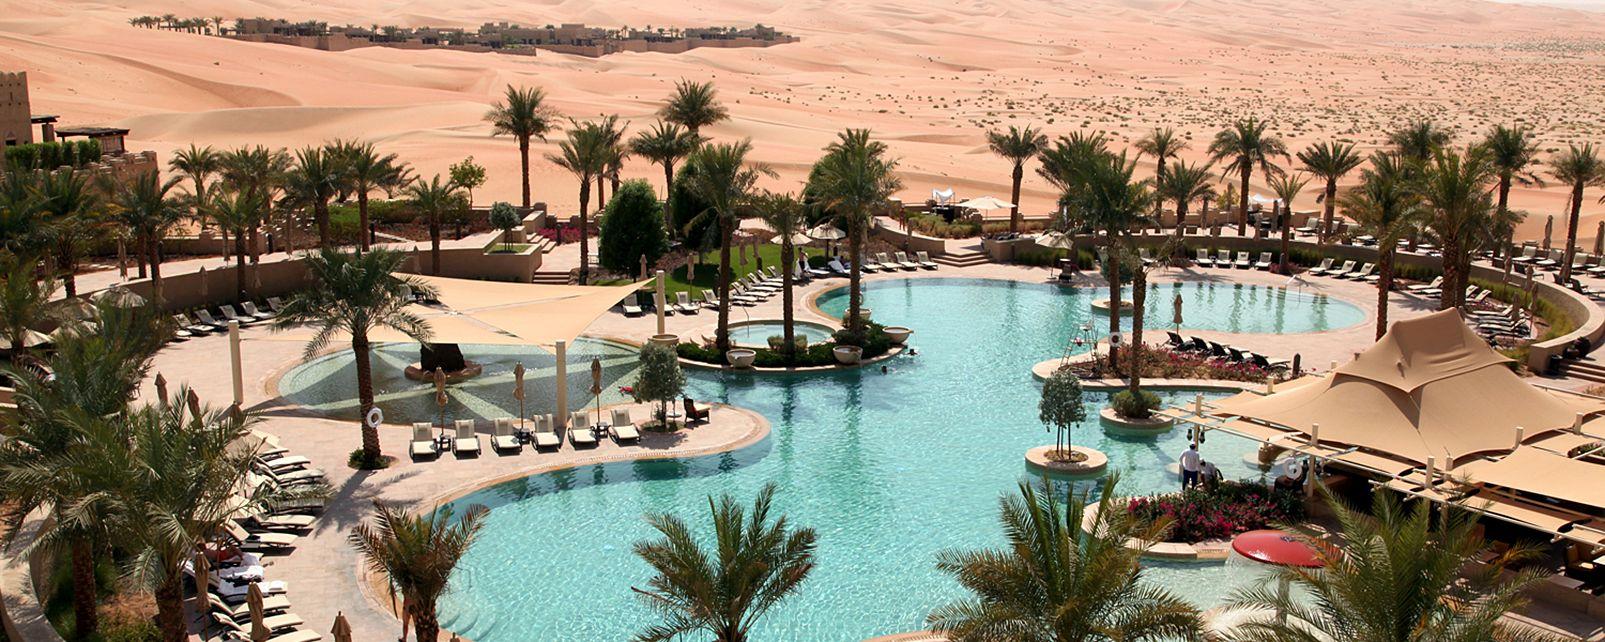 Hotel Qasr Al Sarab Desert Resort by Anantara